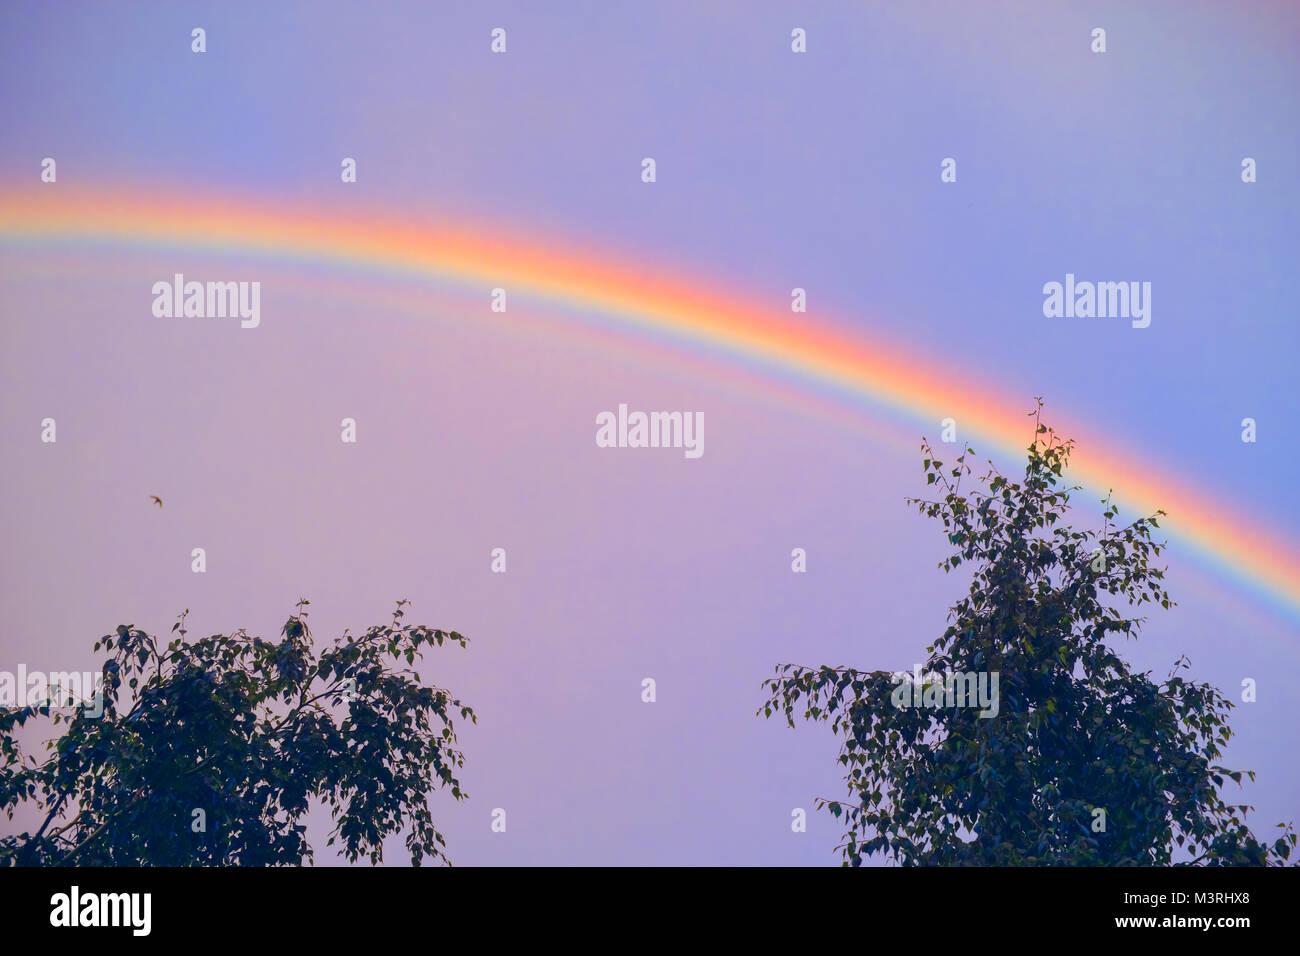 Arc-en-ciel sur ciel bleu. Phénomène naturel Banque D'Images